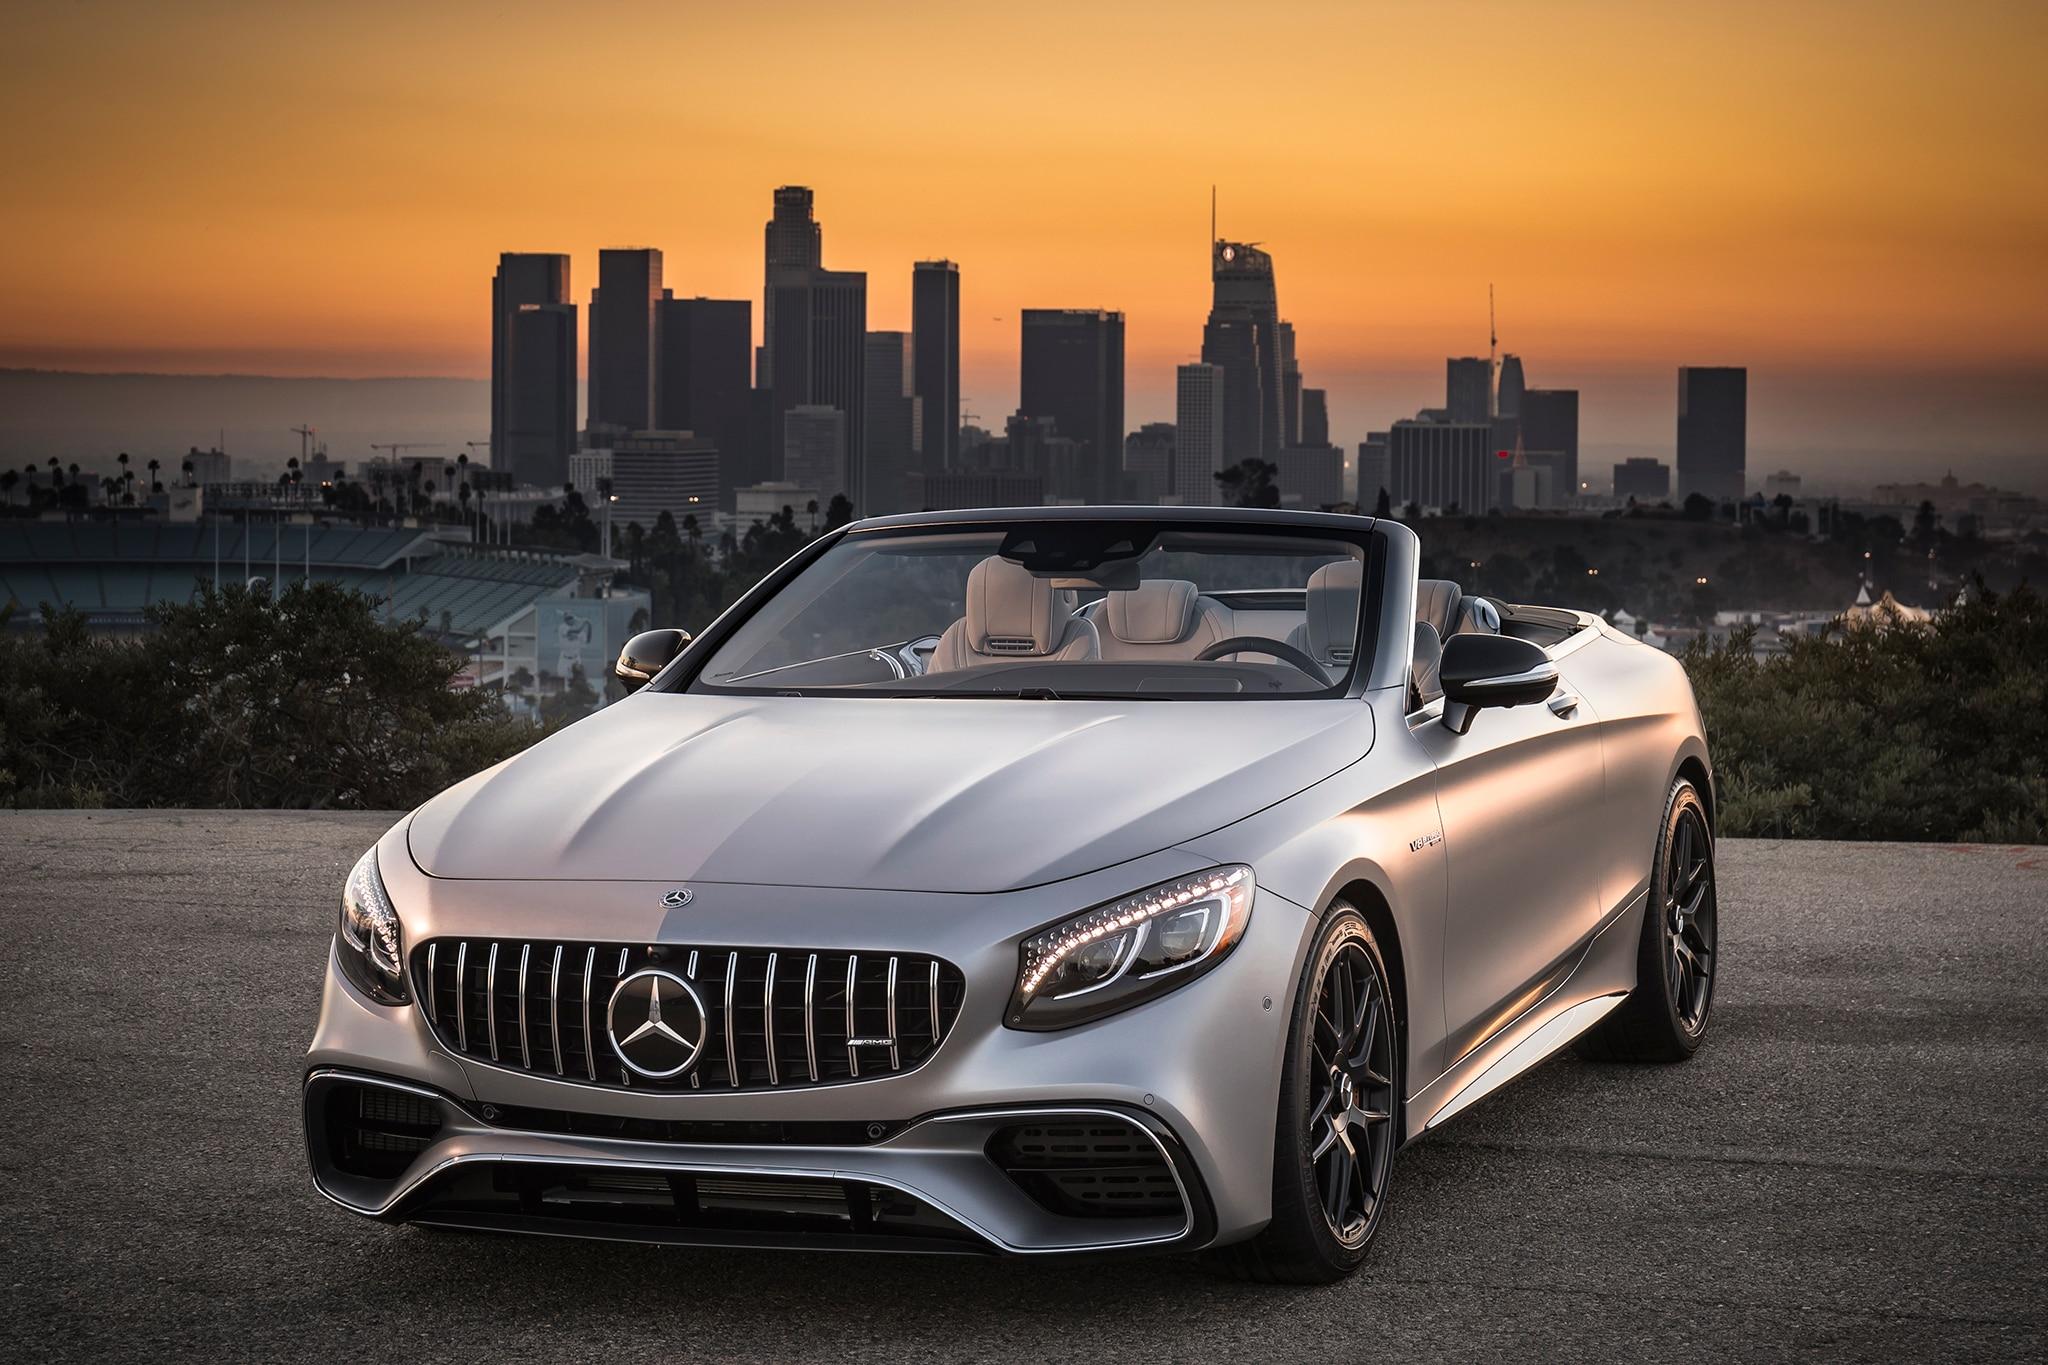 http://st.automobilemag.com/uploads/sites/11/2018/01/2018-Mercedes-AMG-S63-Cabriolet-front-three-quarter-03.jpg